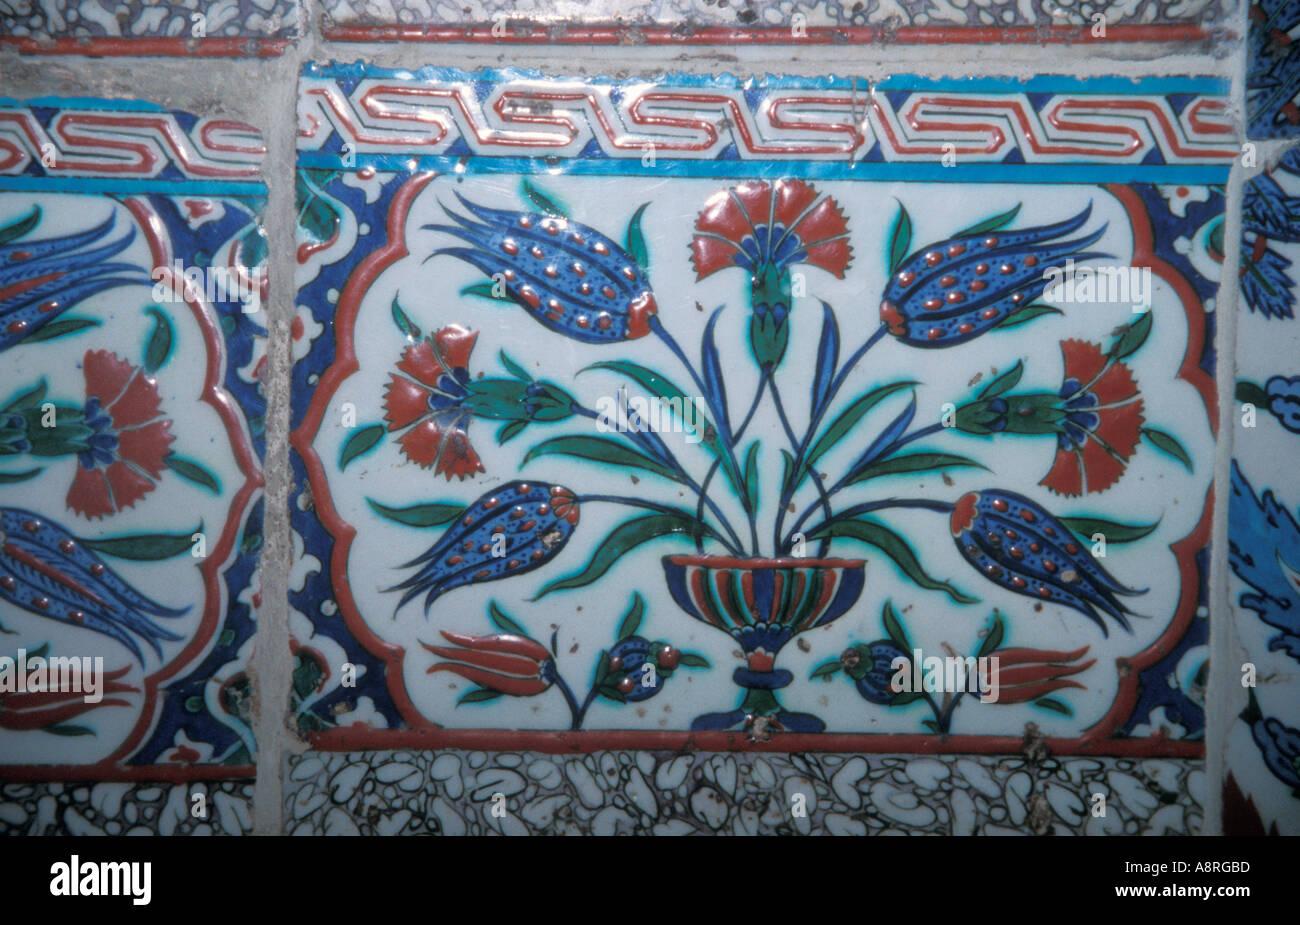 Fliesen an den Wänden des Topkapi-Palastes Istanbul Stockbild